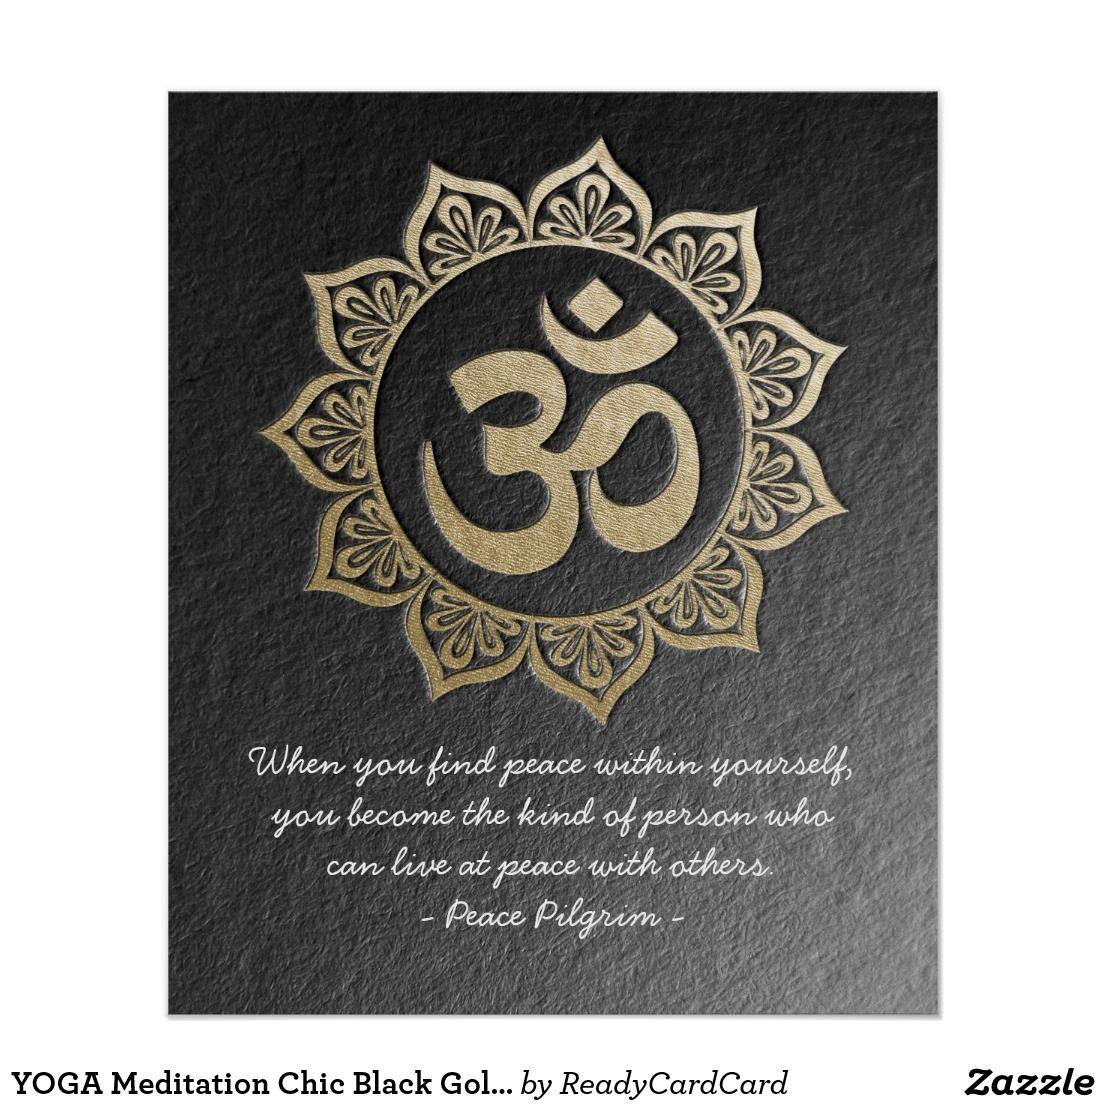 YOGA Meditation Chic Black Gold OM Mandala Quotes Poster ...